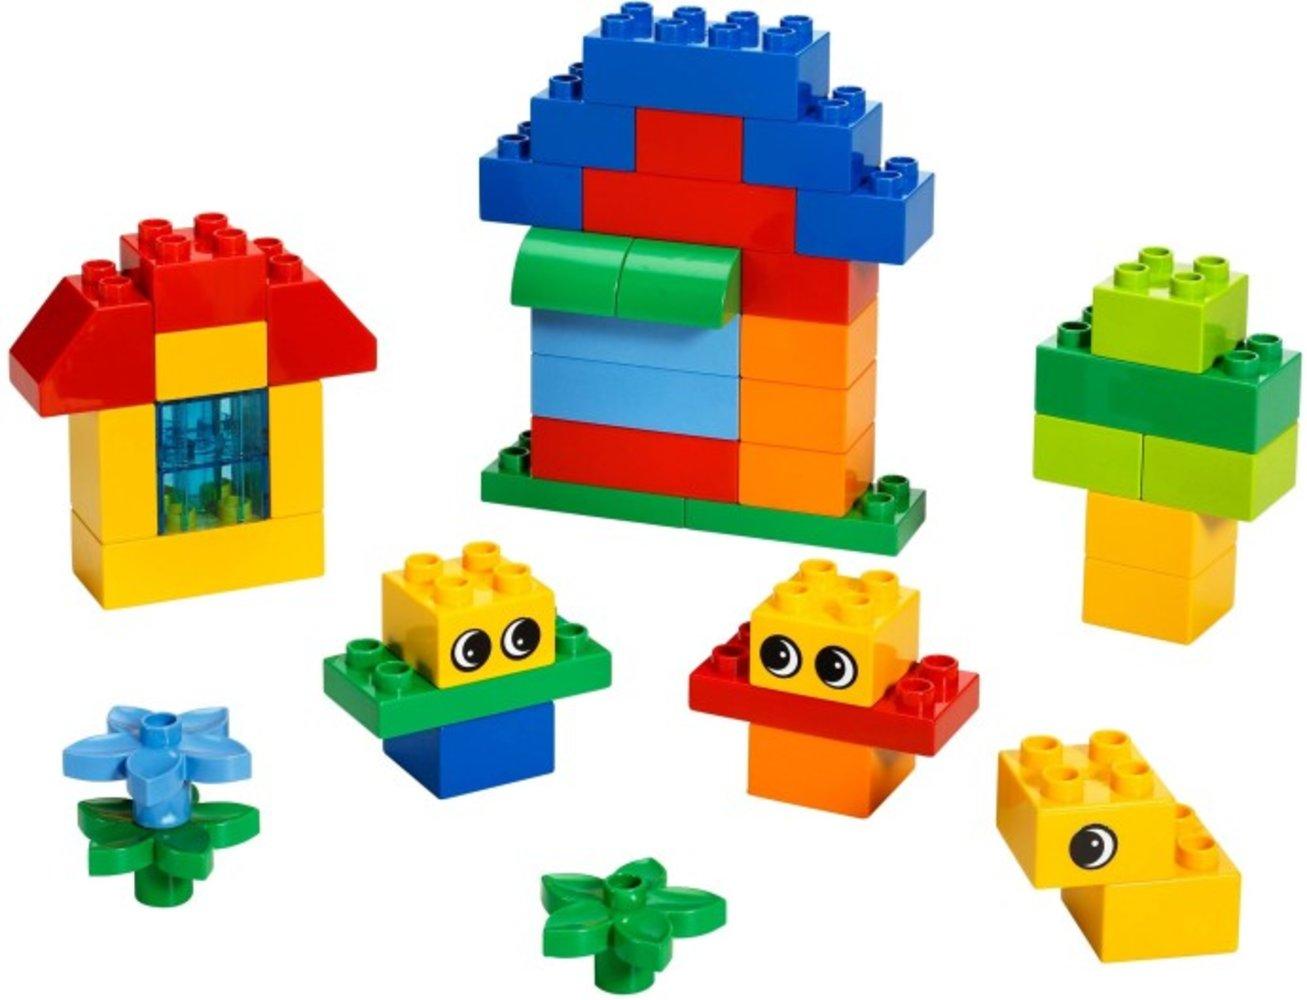 Fun With Duplo Bricks